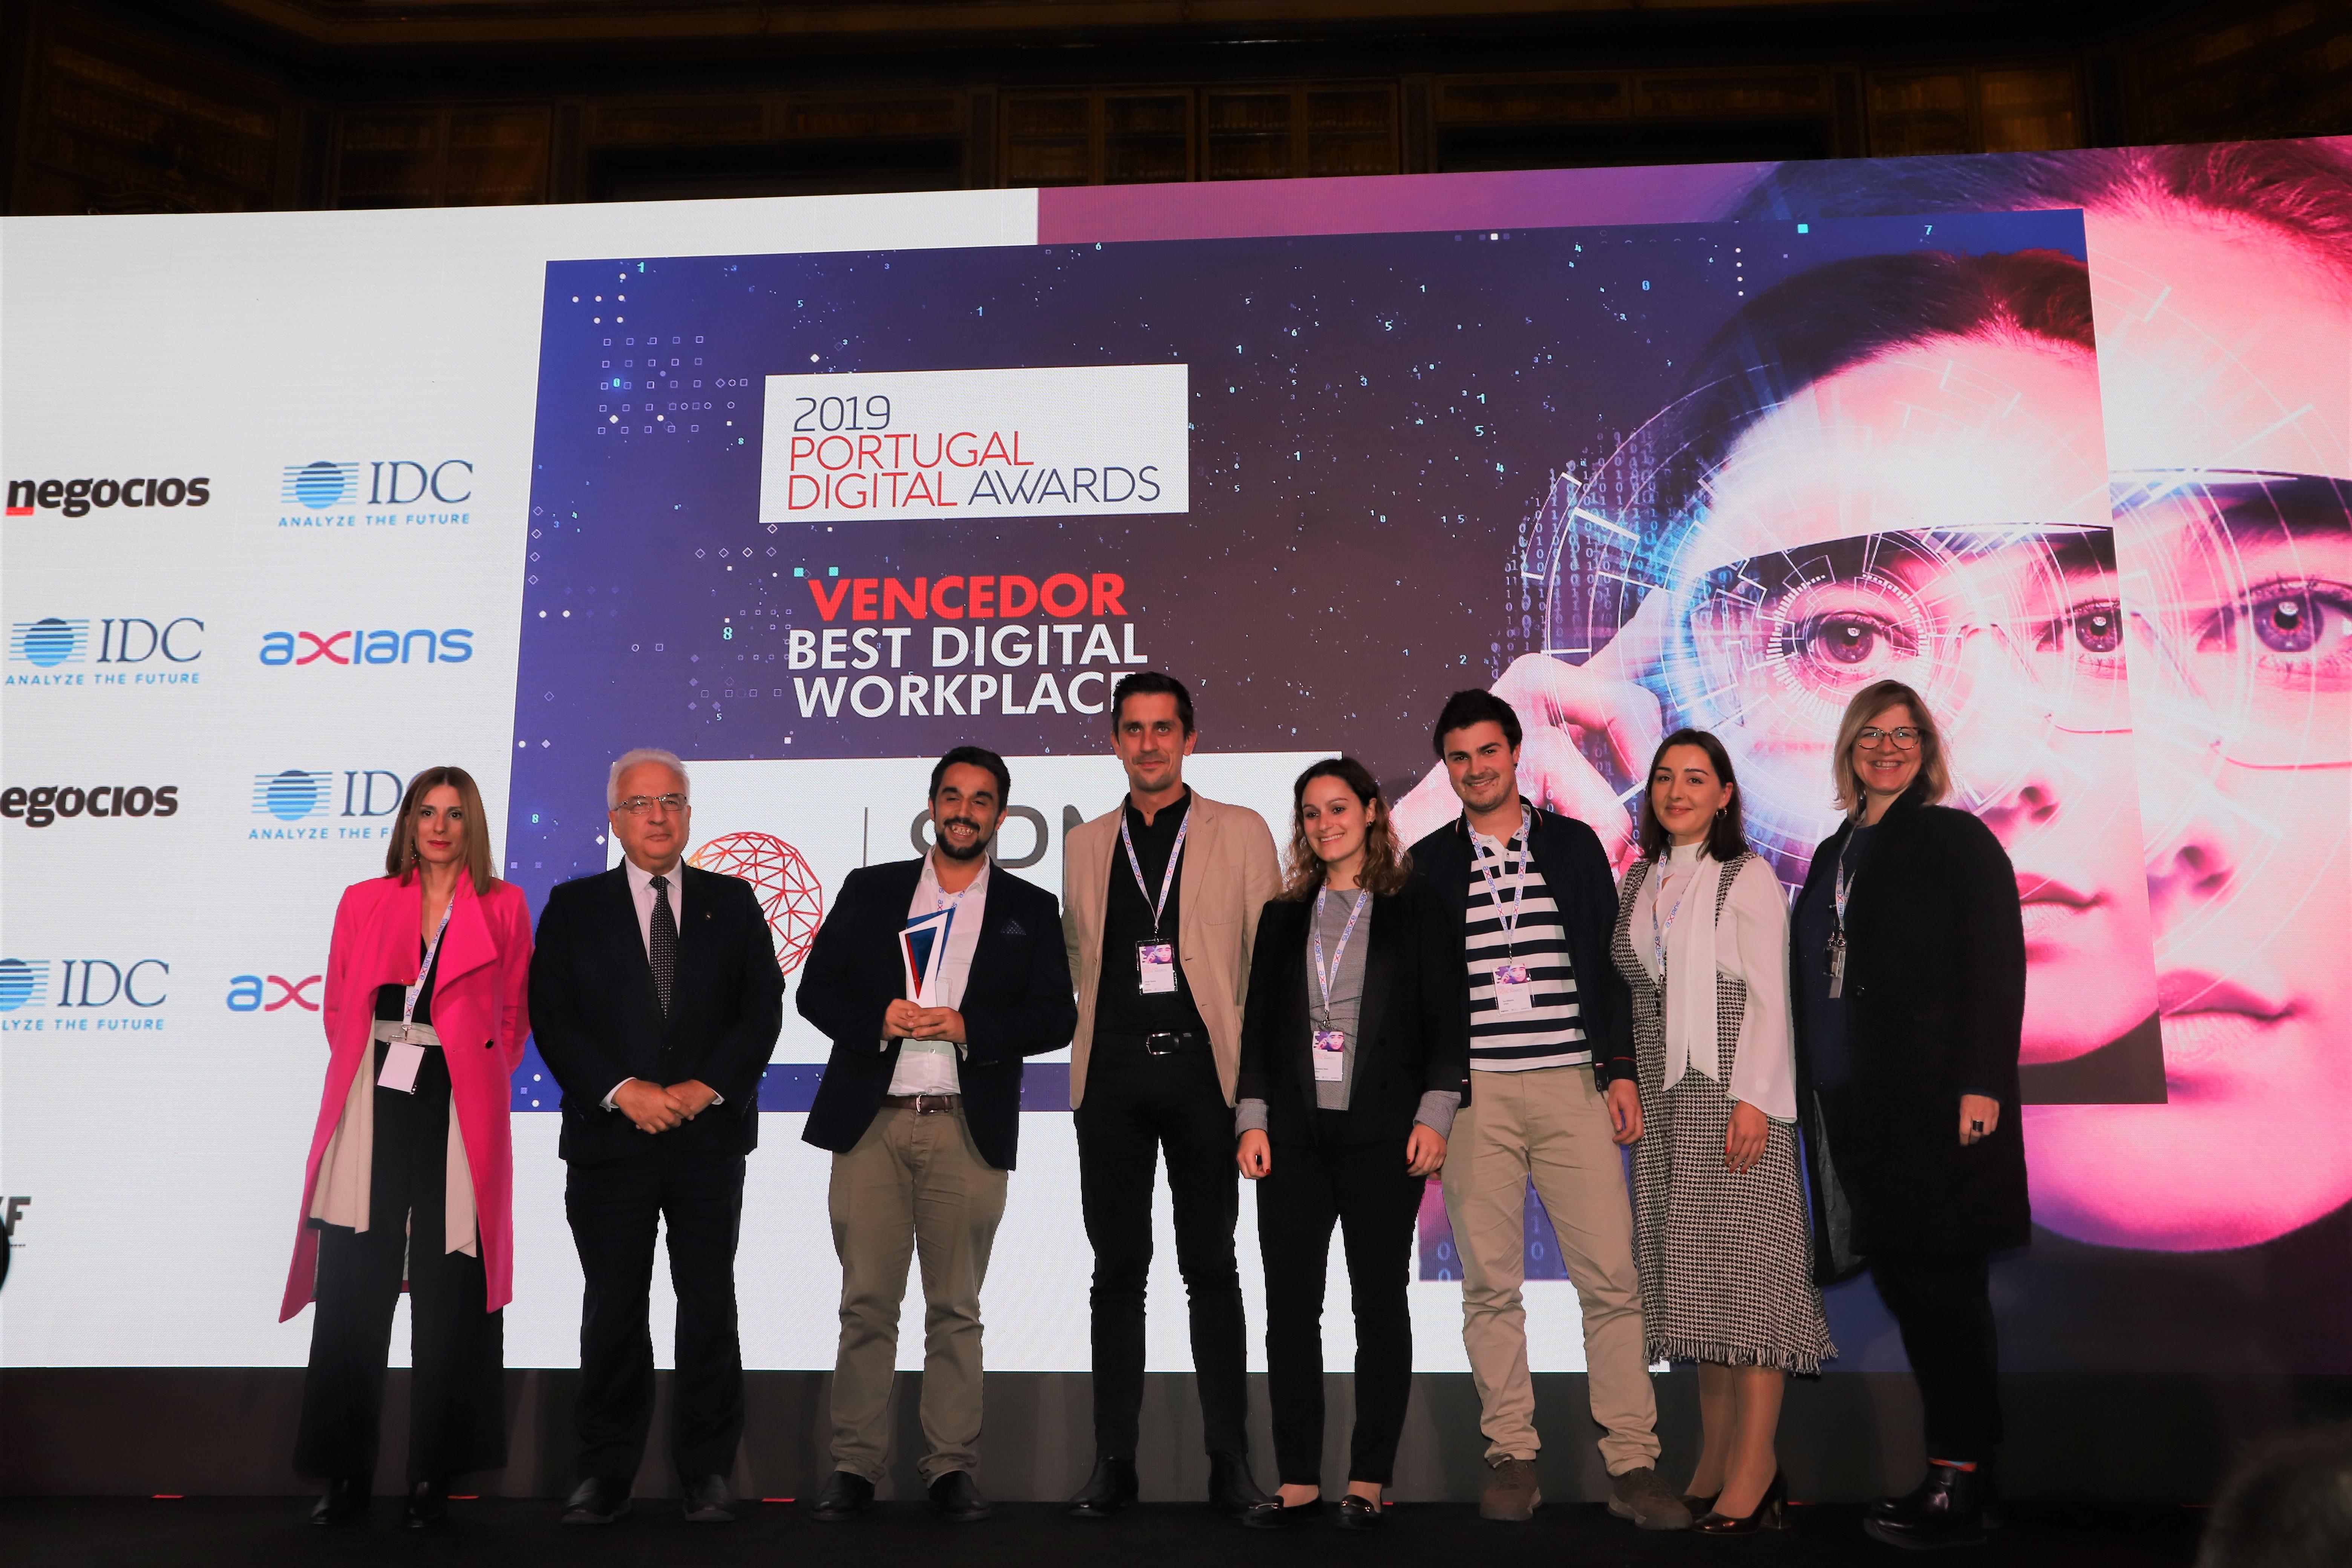 Equipa SPMS no Portugal Digital Awards